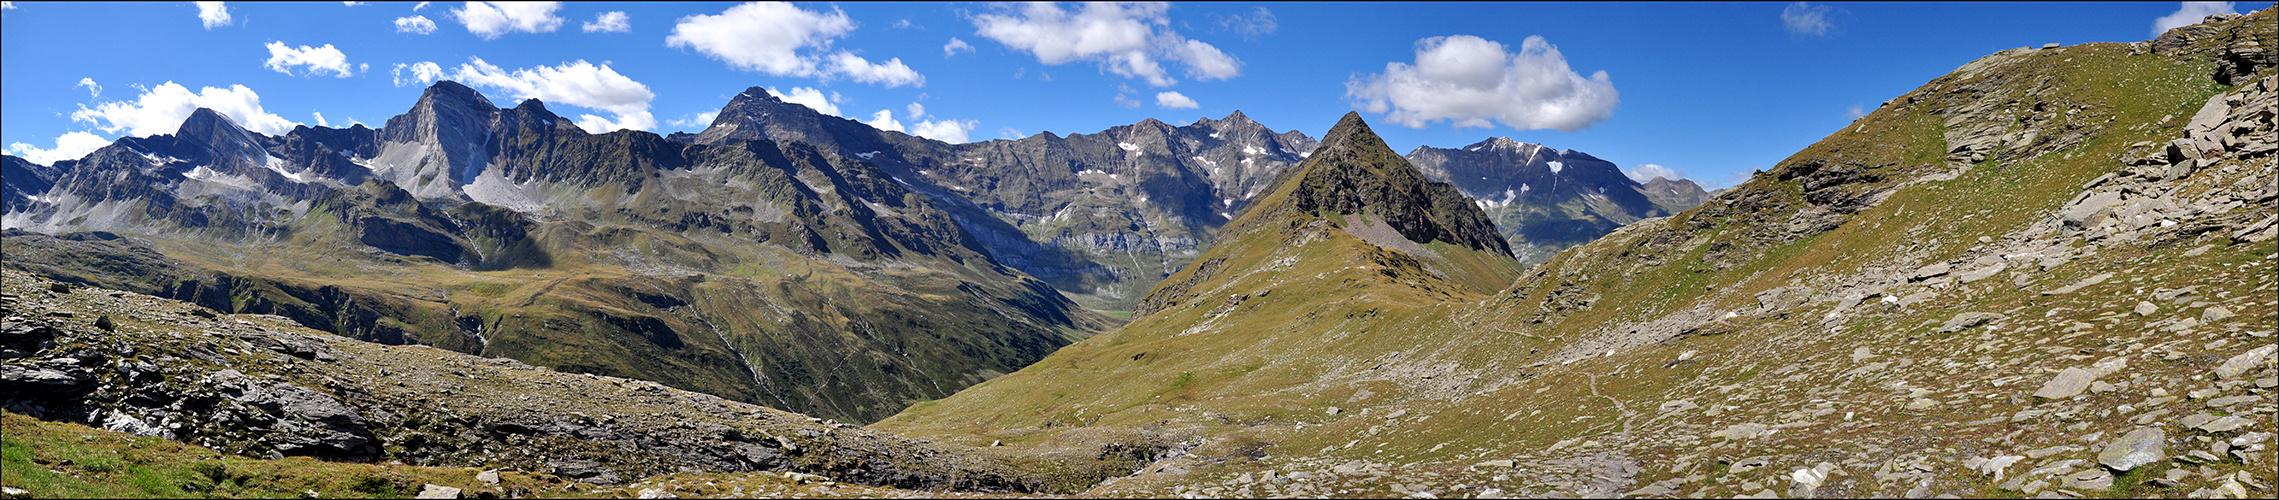 Spronser Joch - Panorama